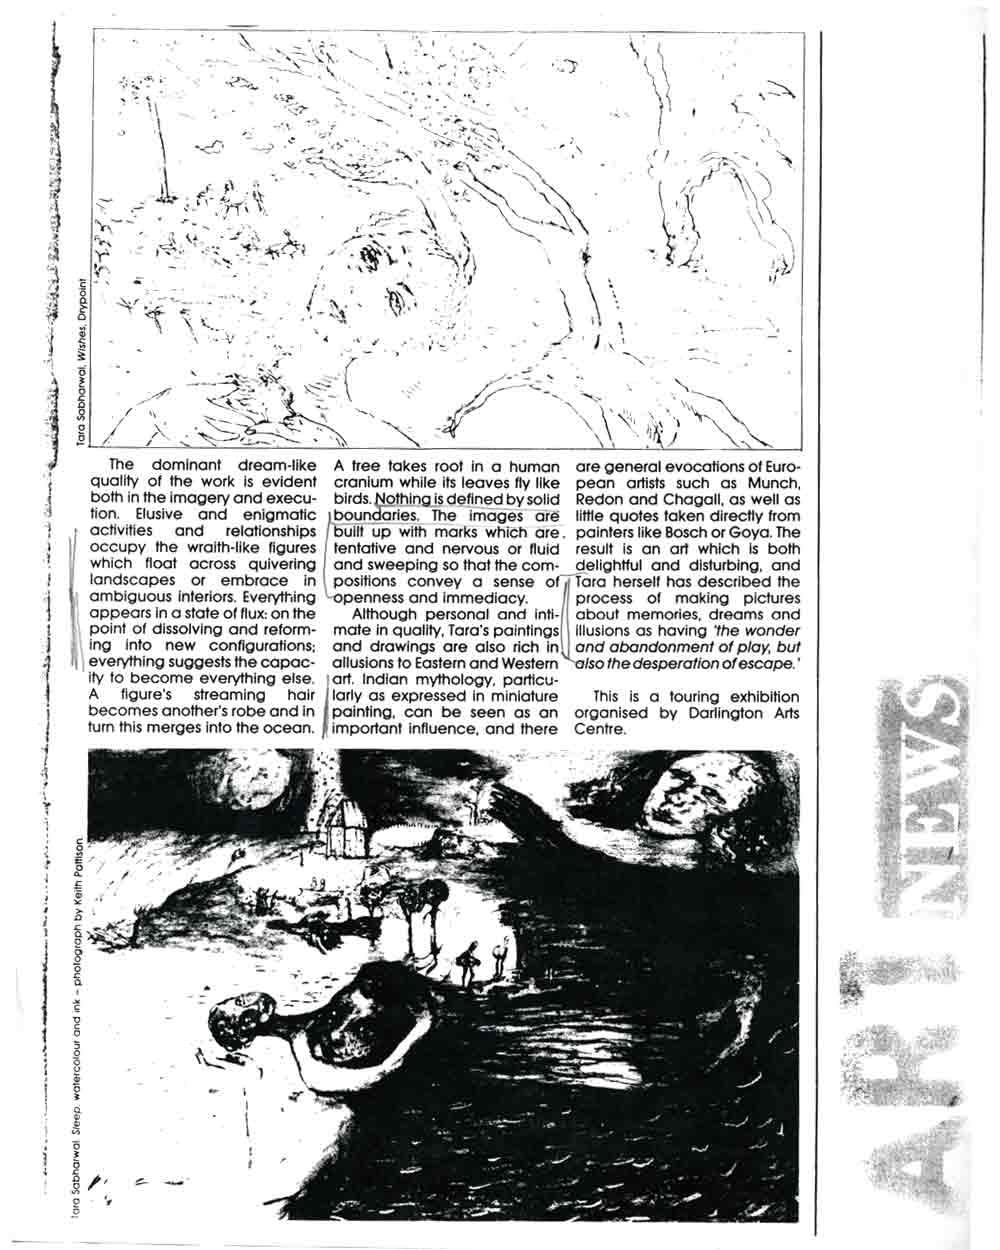 Tara Sabharwal, review, pg 2